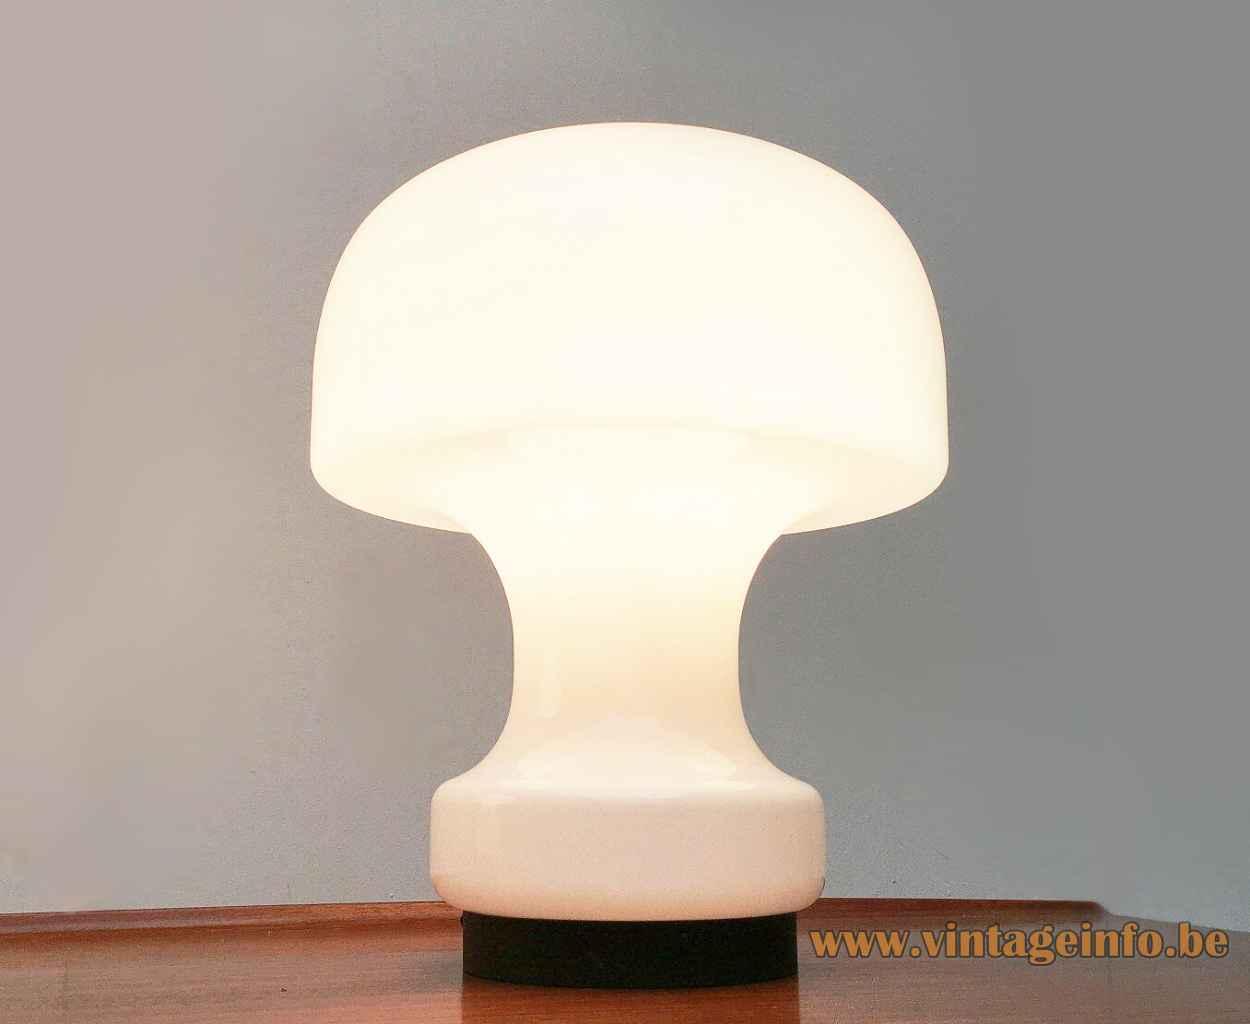 Glashütte Limburg mushroom table lamp round black plastic base white opal glass lampshade 1970s Germany